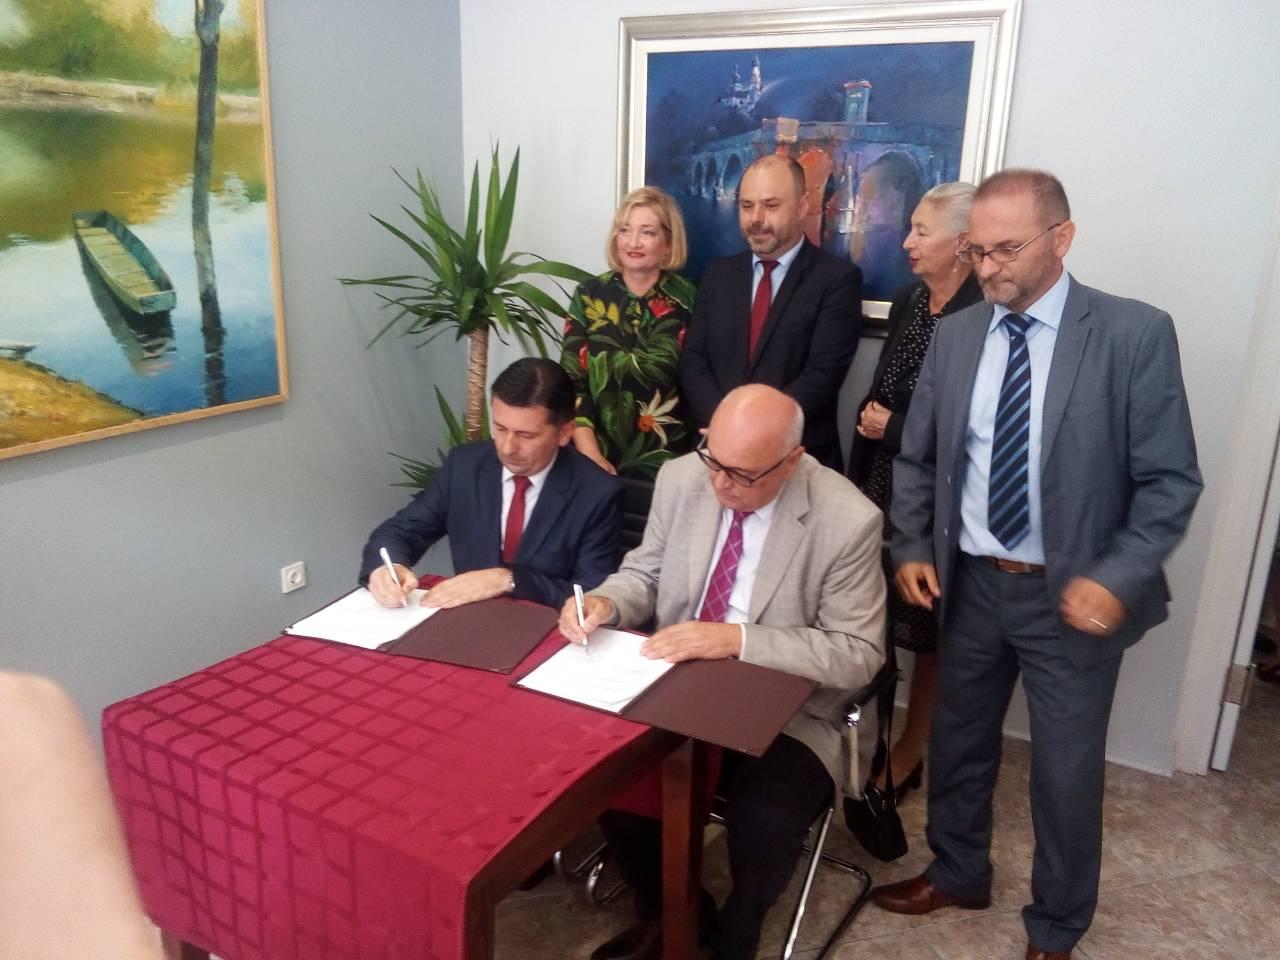 Potpisisvanje protokola